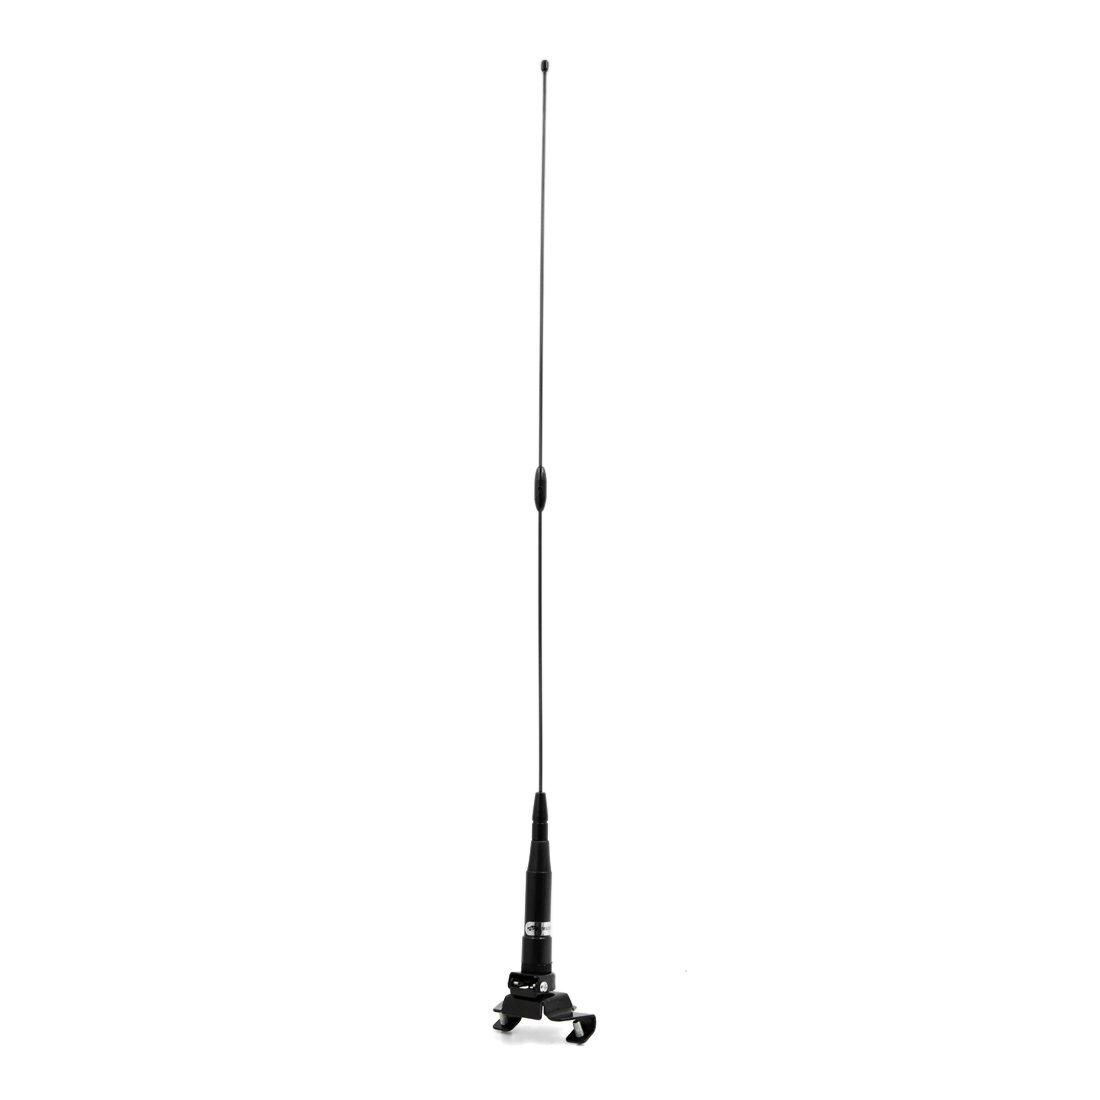 uxcell Black 60cm Length Adjustable Angle Screw Fixing Car Decorative Antenna